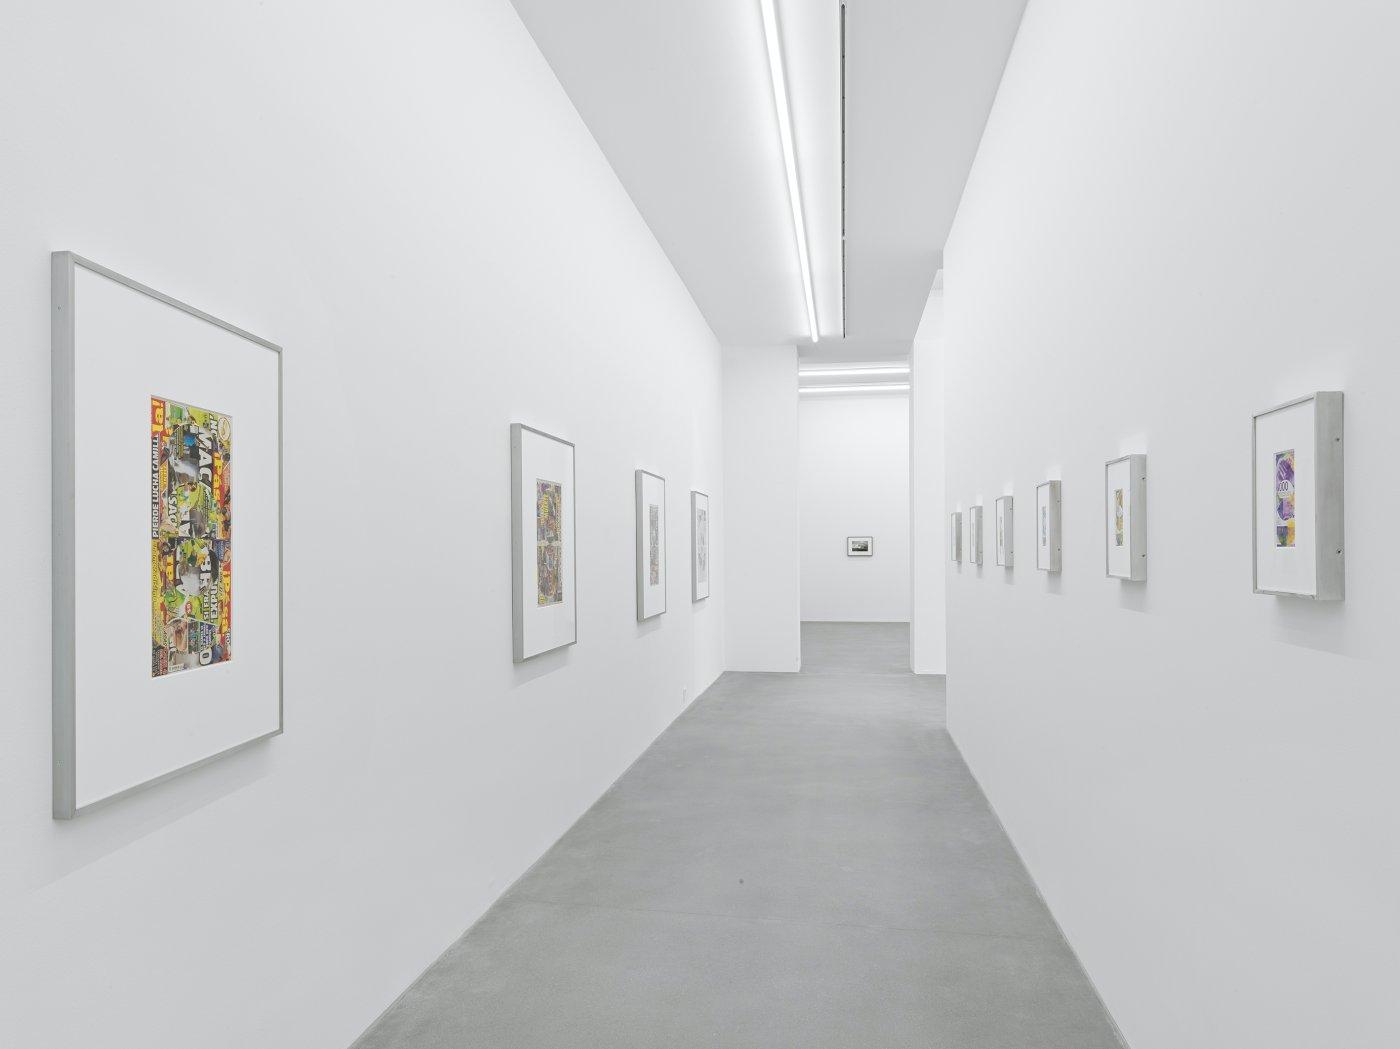 Galerie Eva Presenhuber Waldmanstrasse Walead Beshty 3